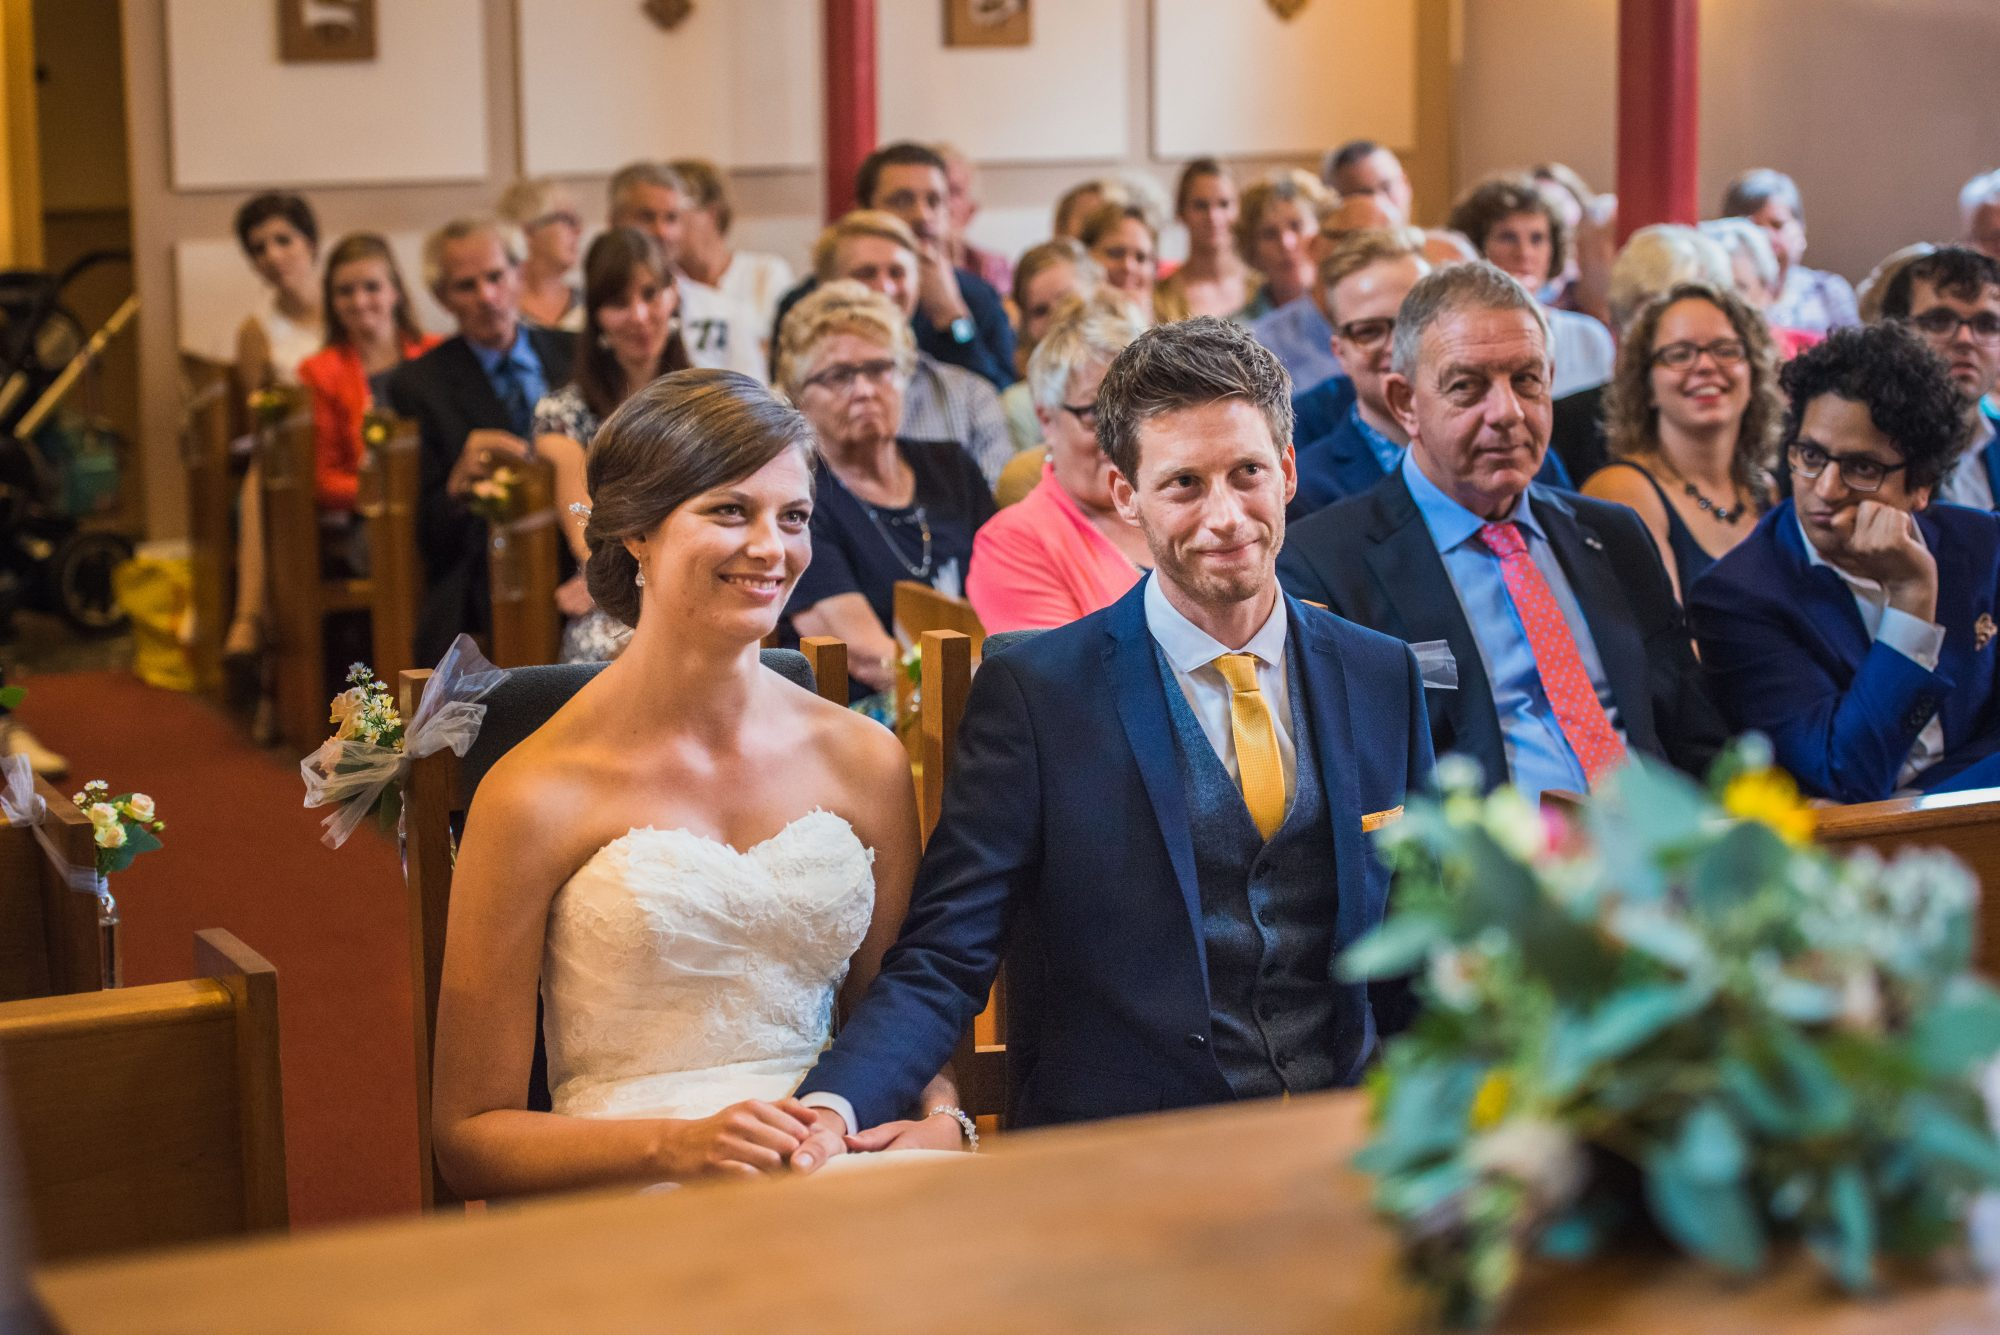 bruiloft-roland-annewil-438